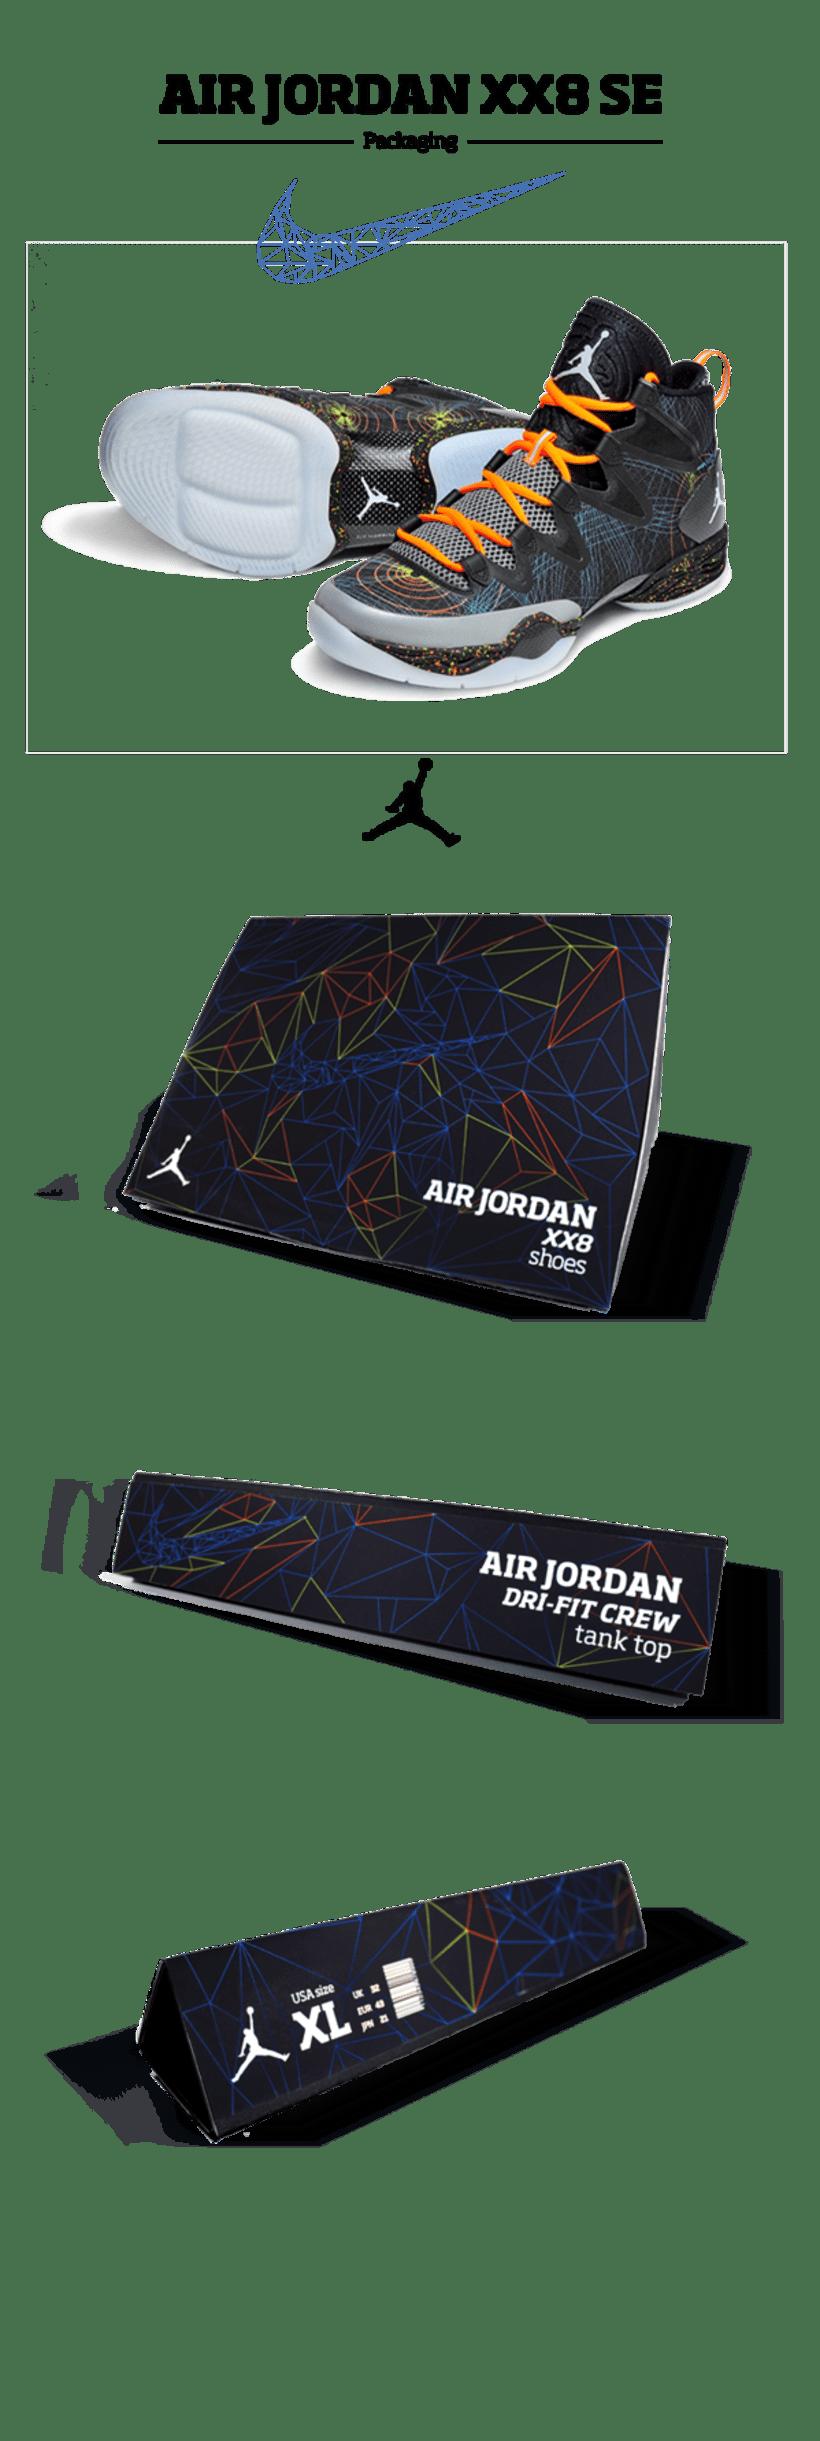 Air Jordan XX8 ~ Packaging 0